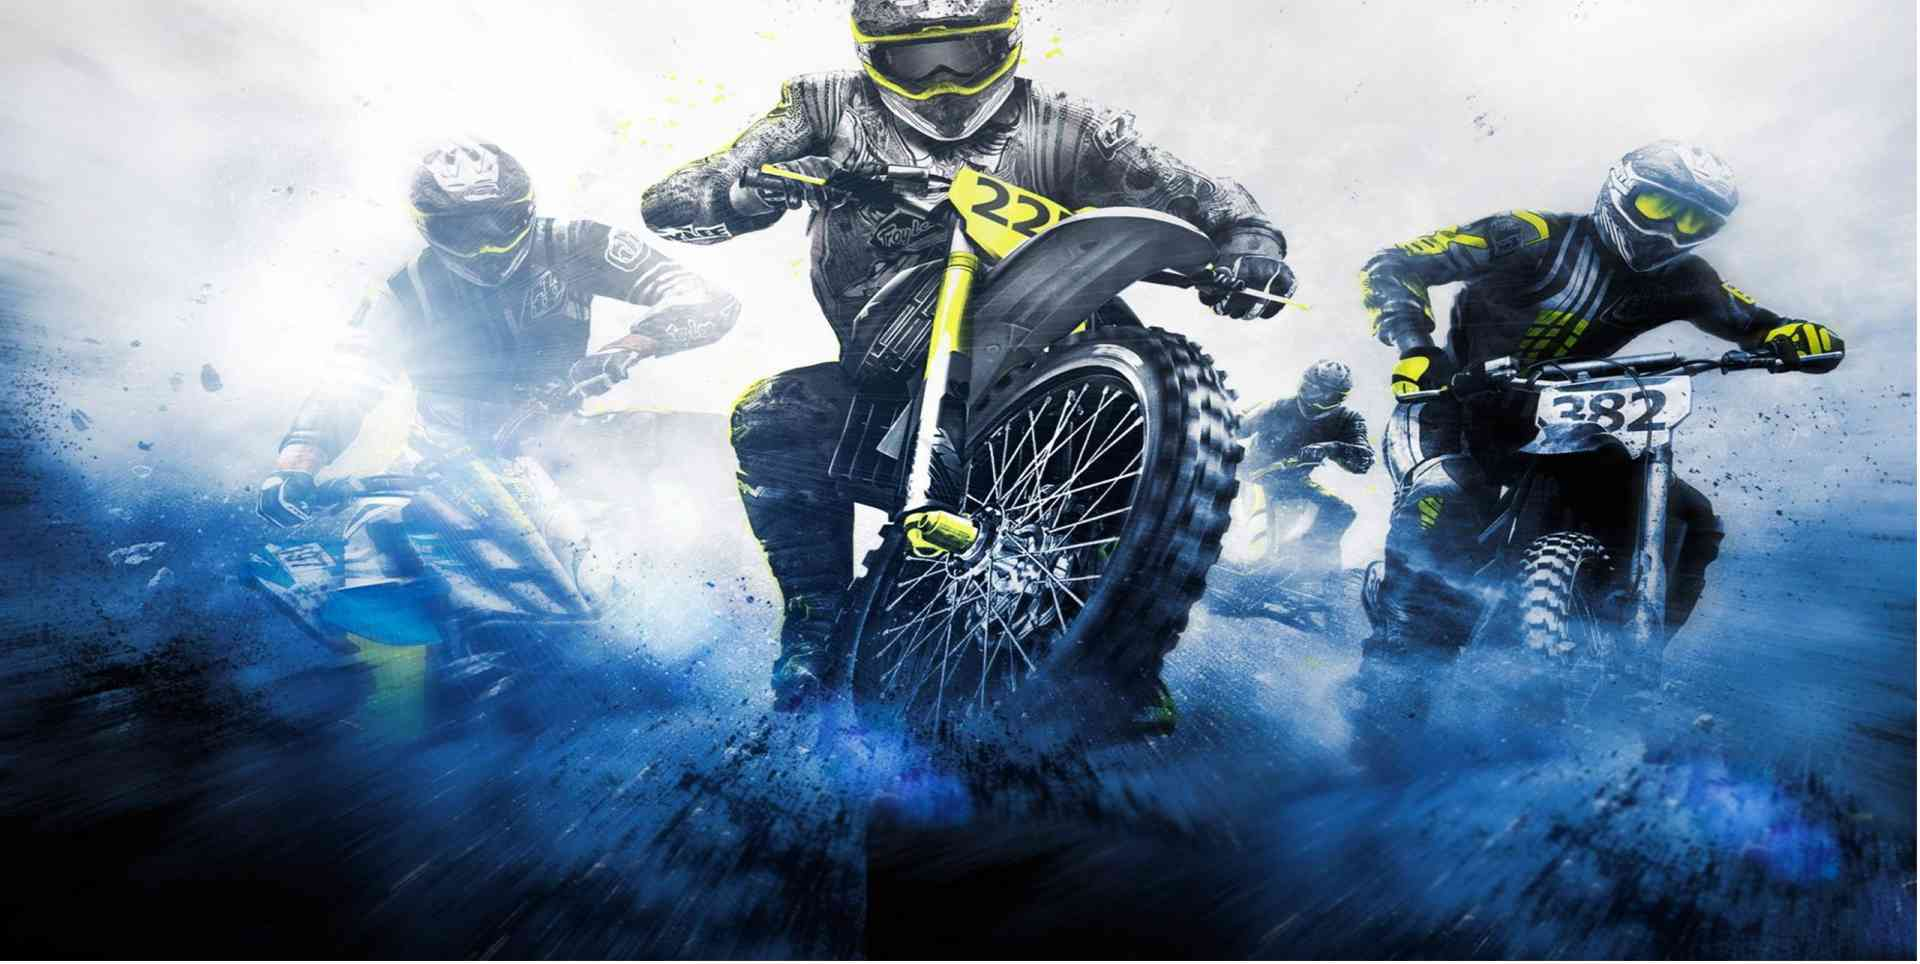 MXGP of Trentino Live Stream 2020